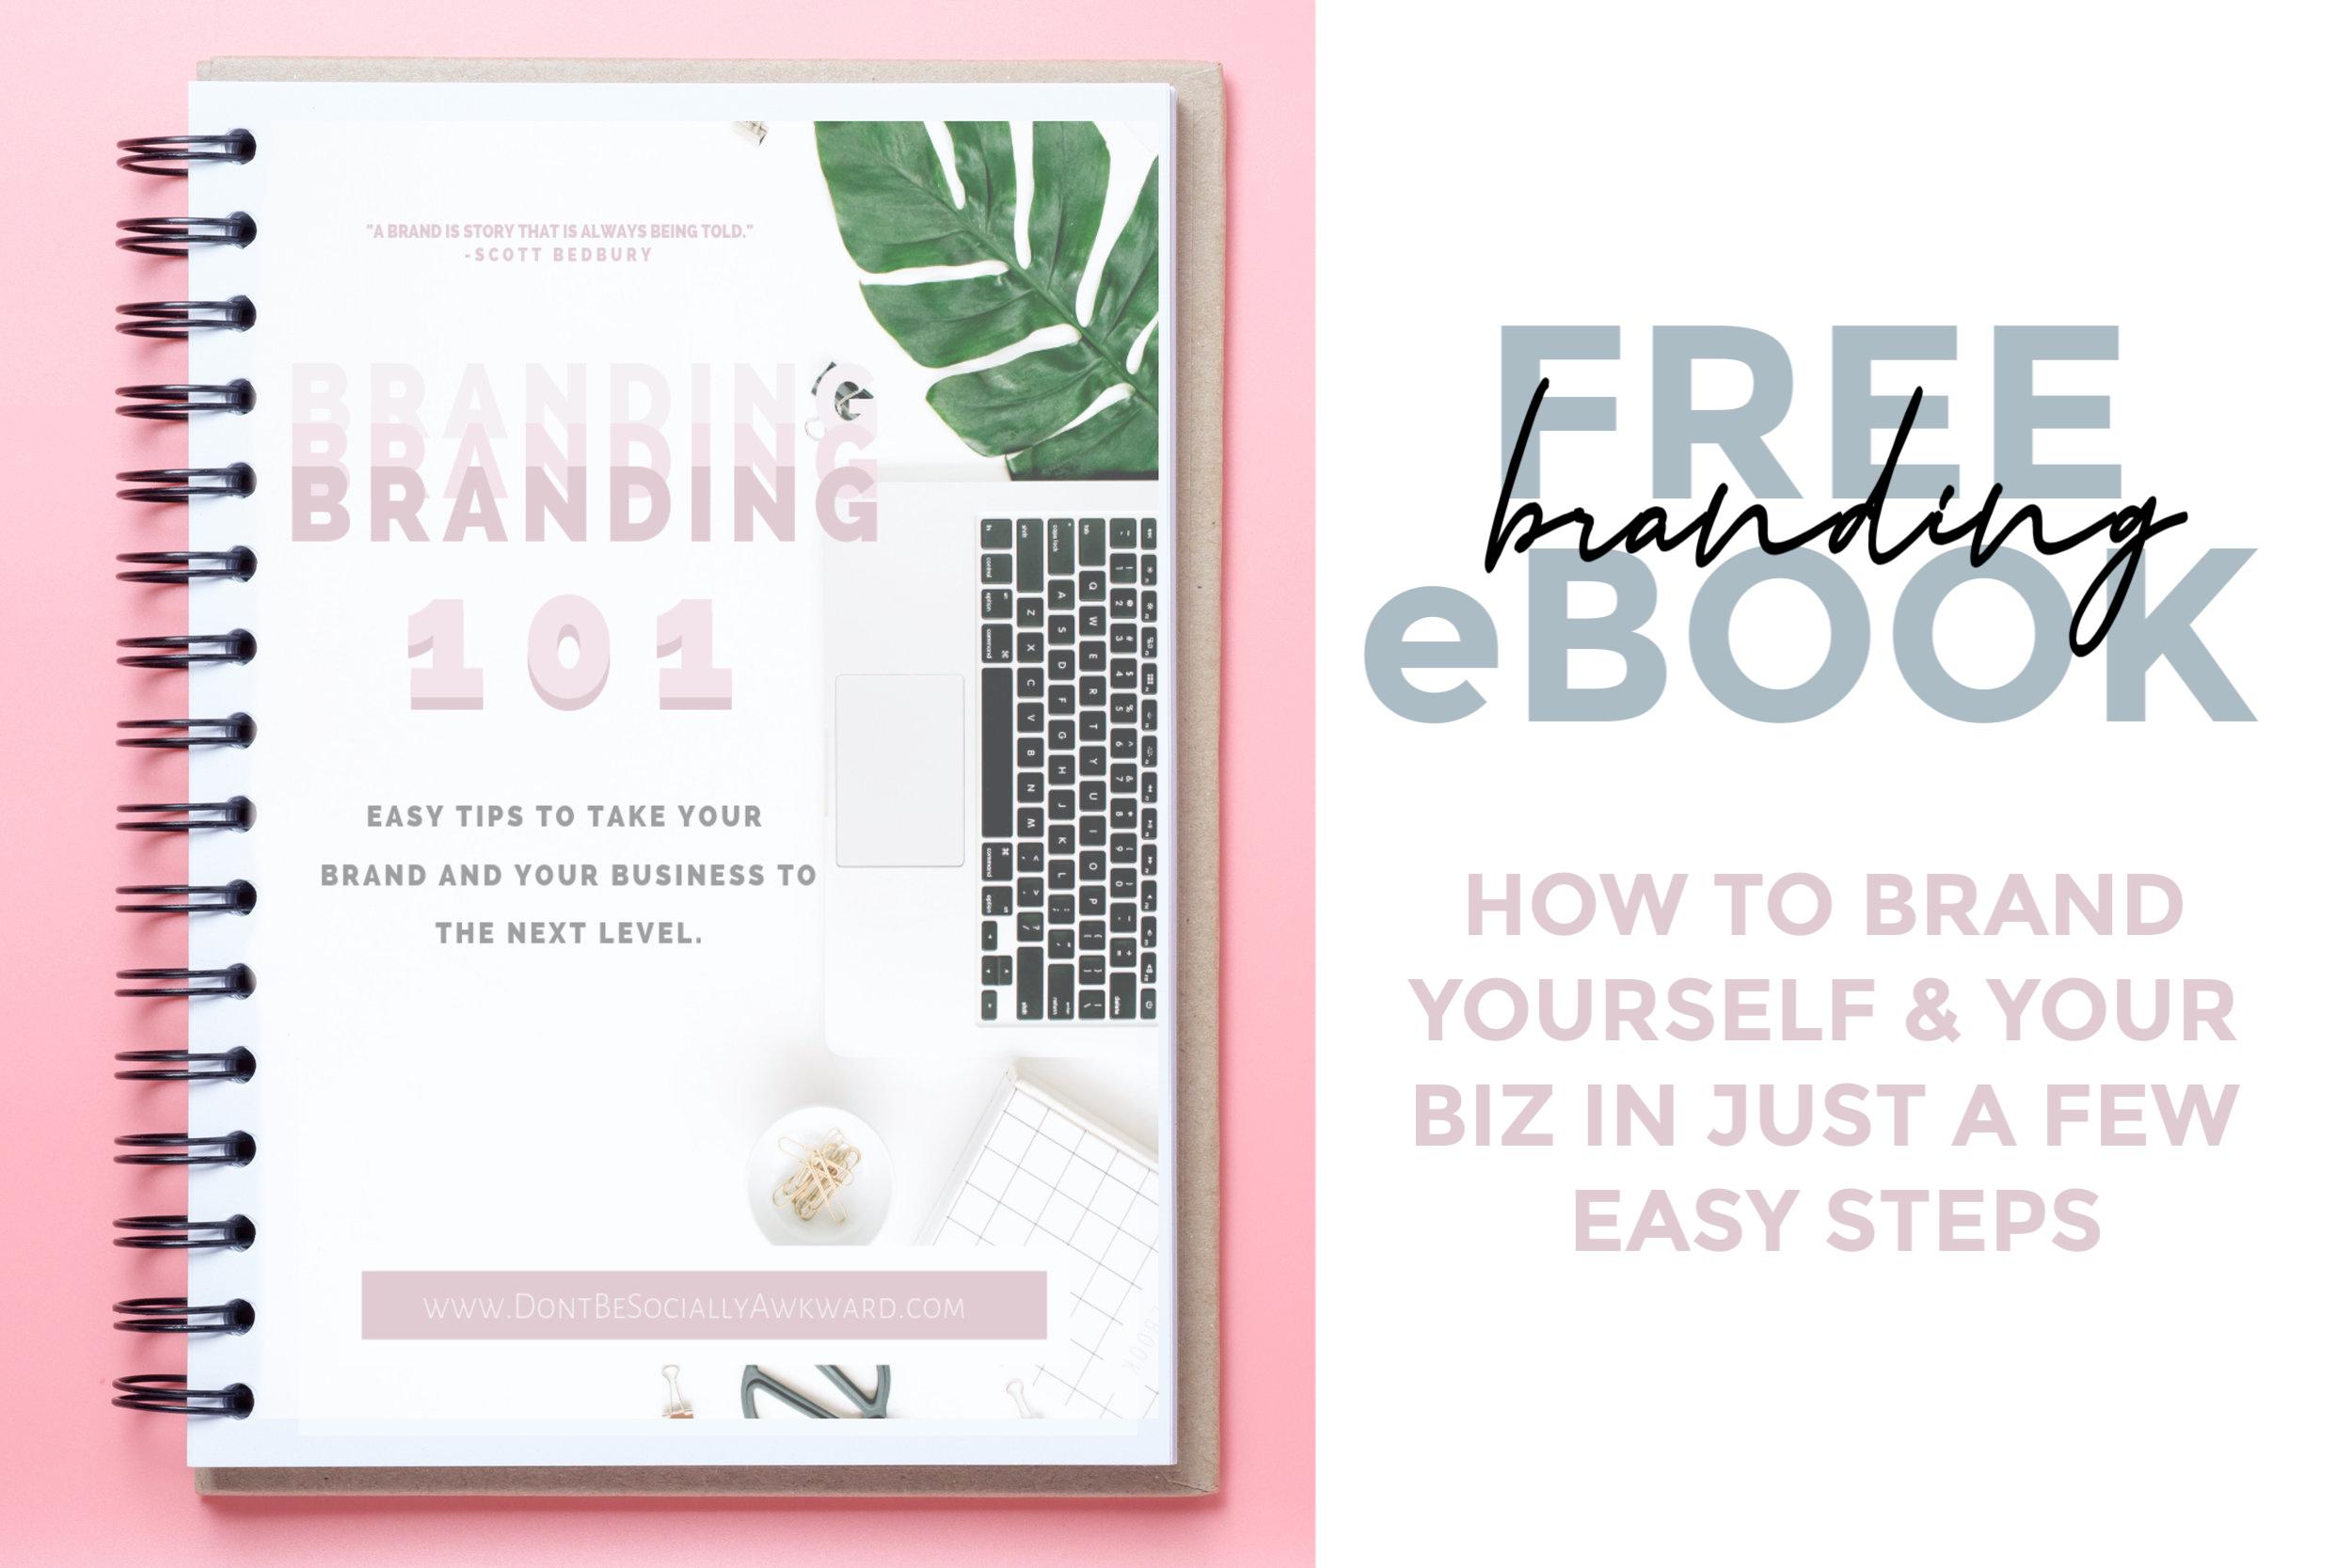 Free Branding eBook